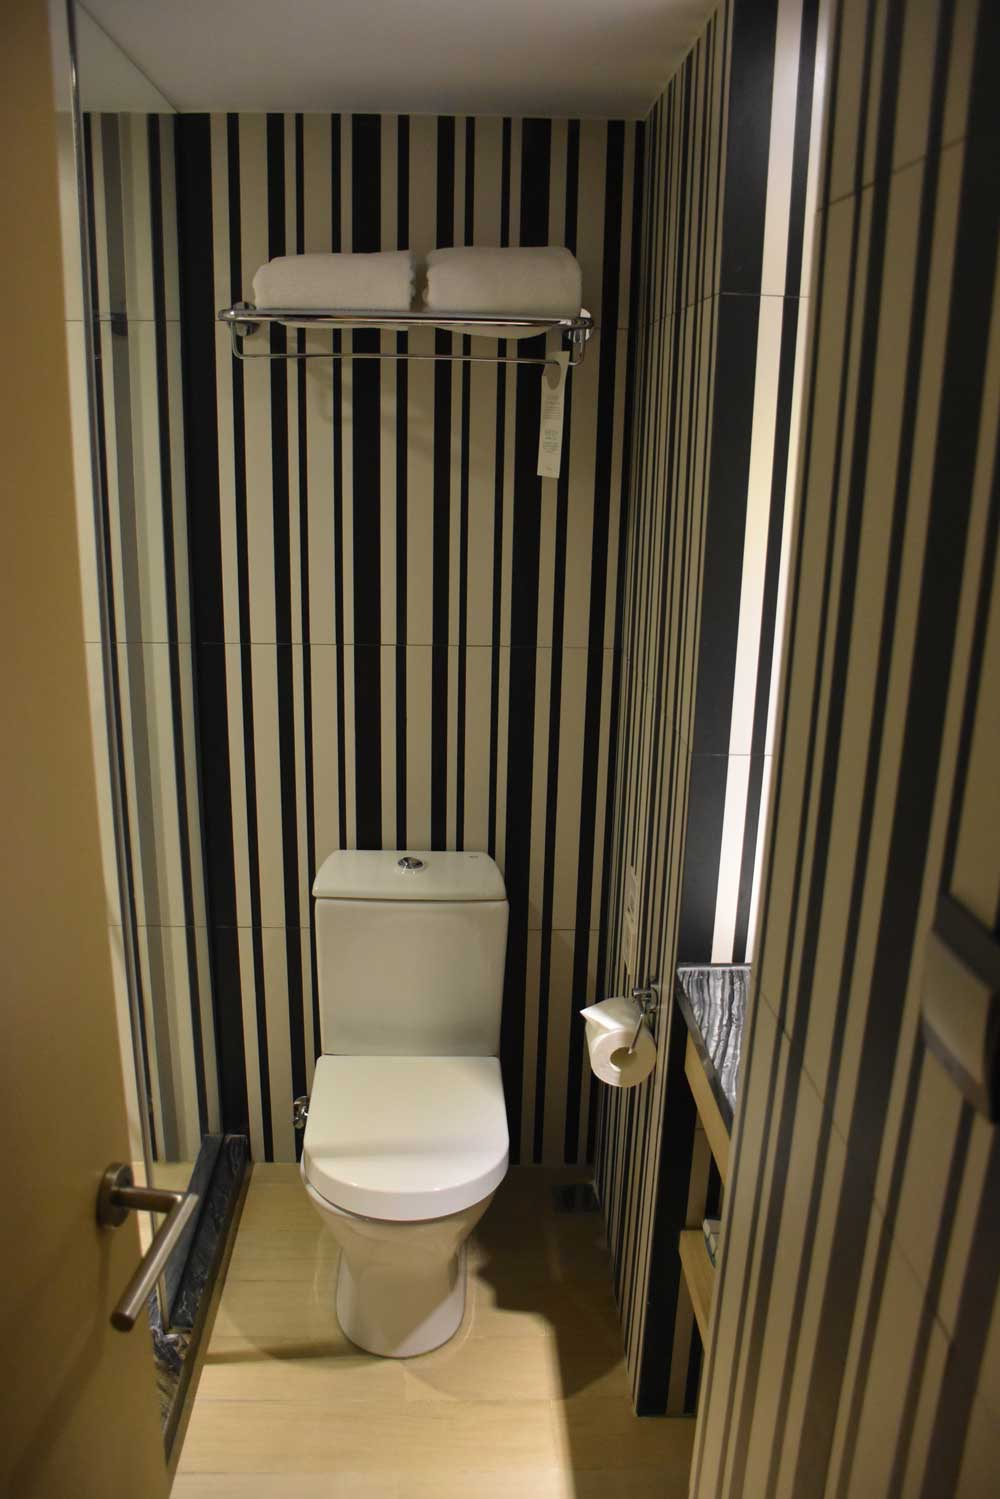 Macau budget hotels Caravel Hotel bathroom